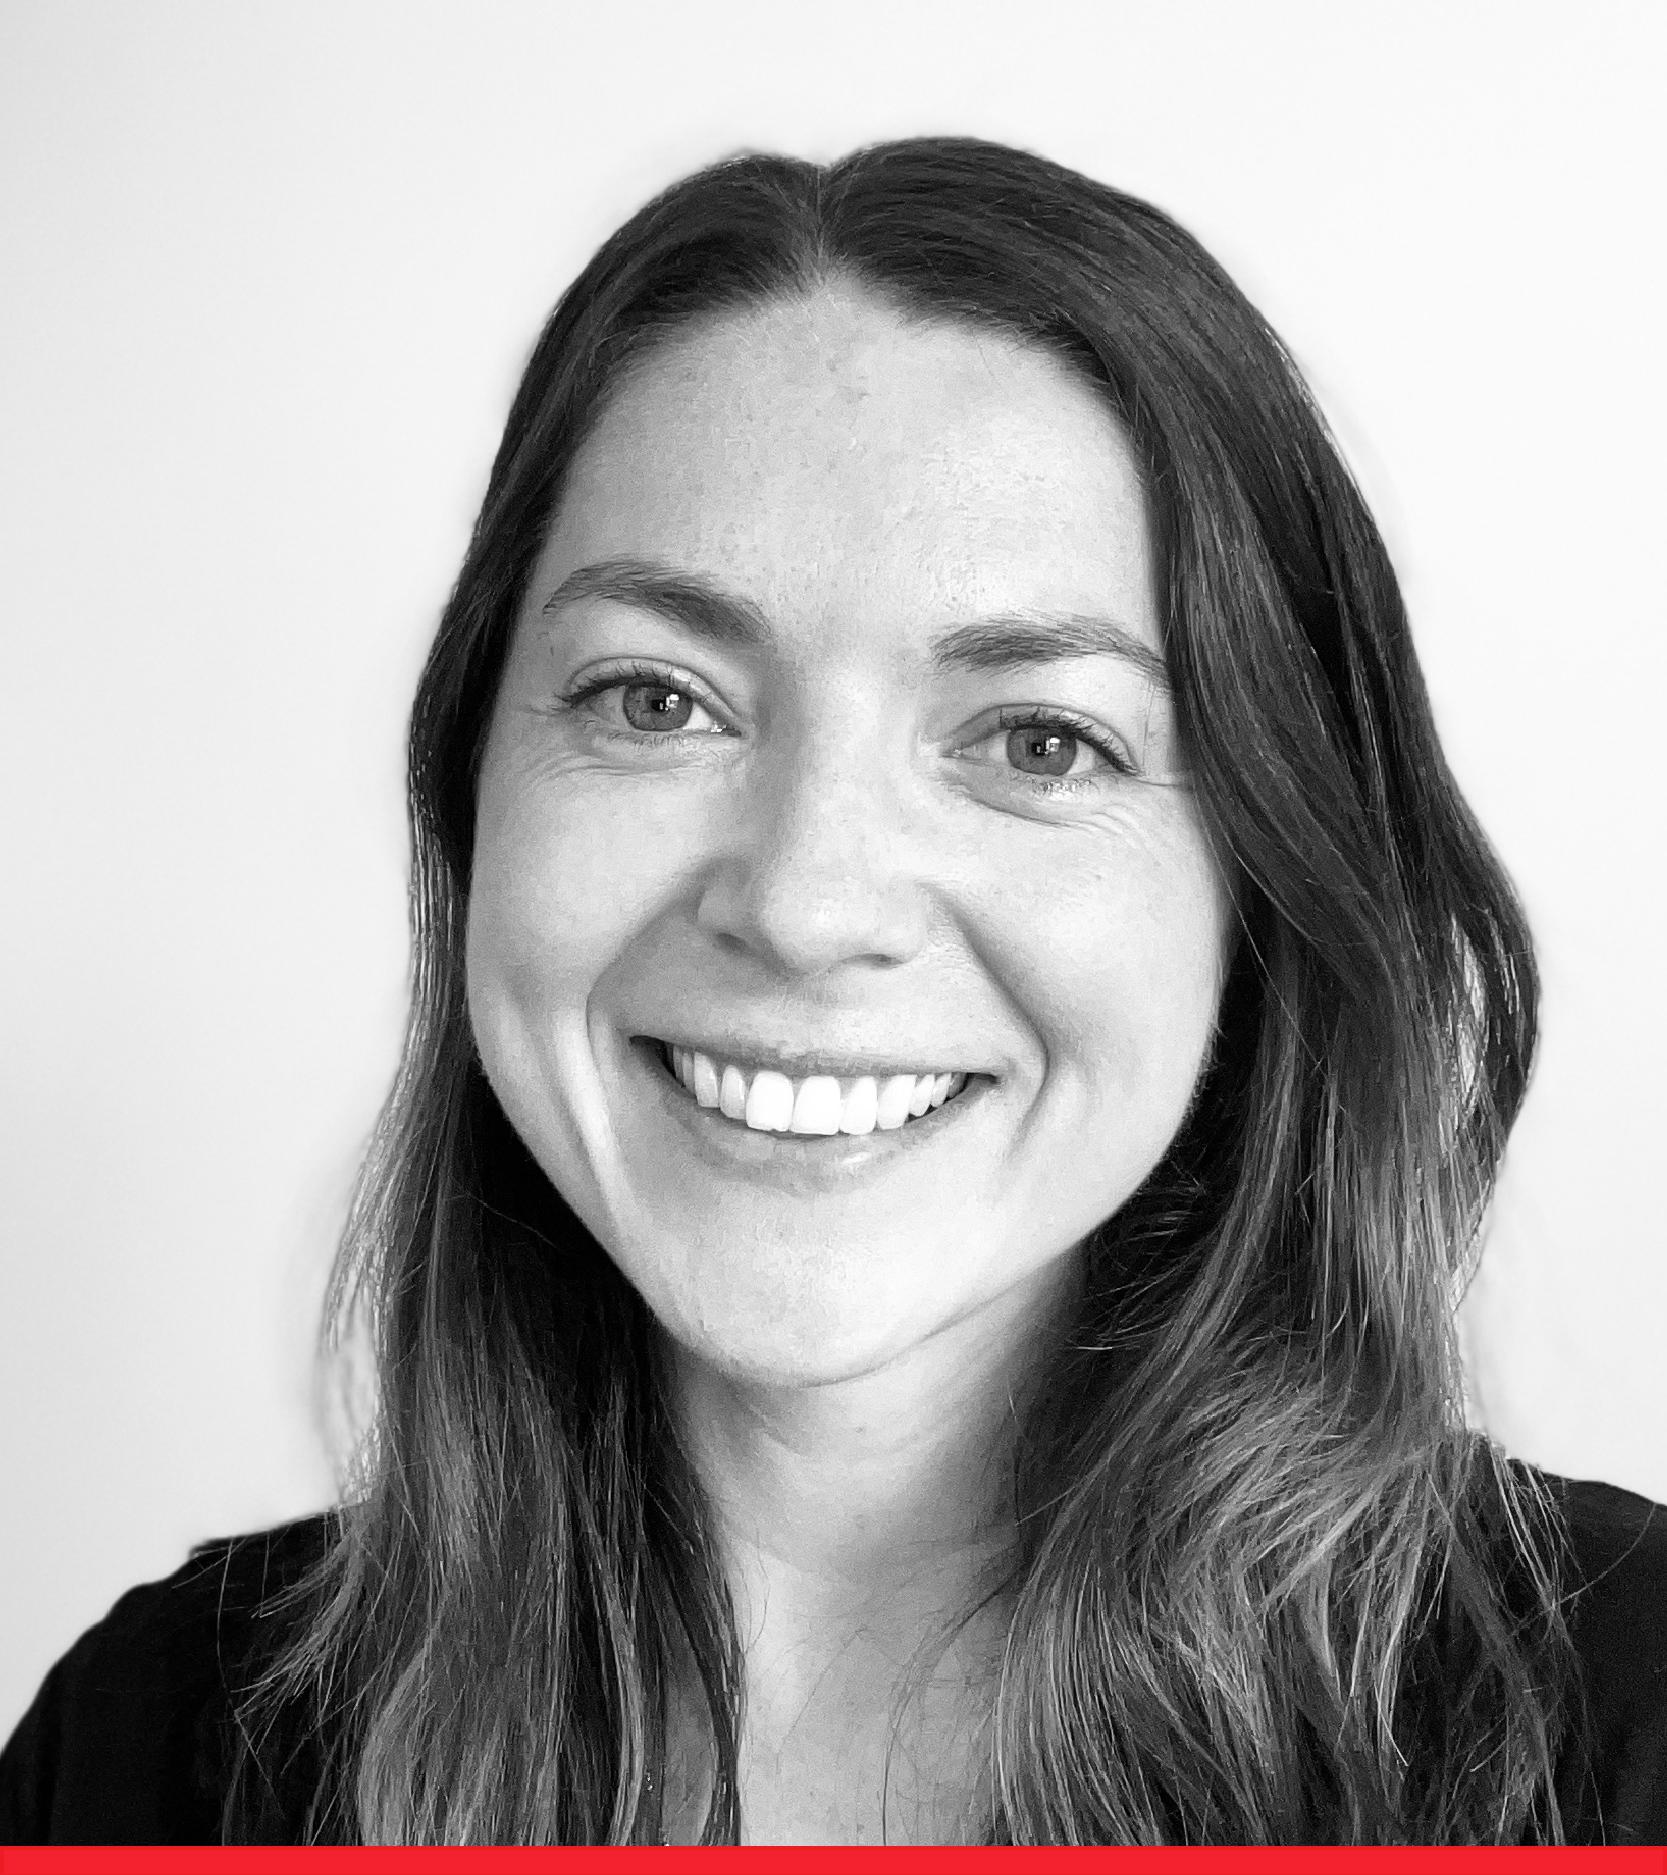 Sarah Bornstein